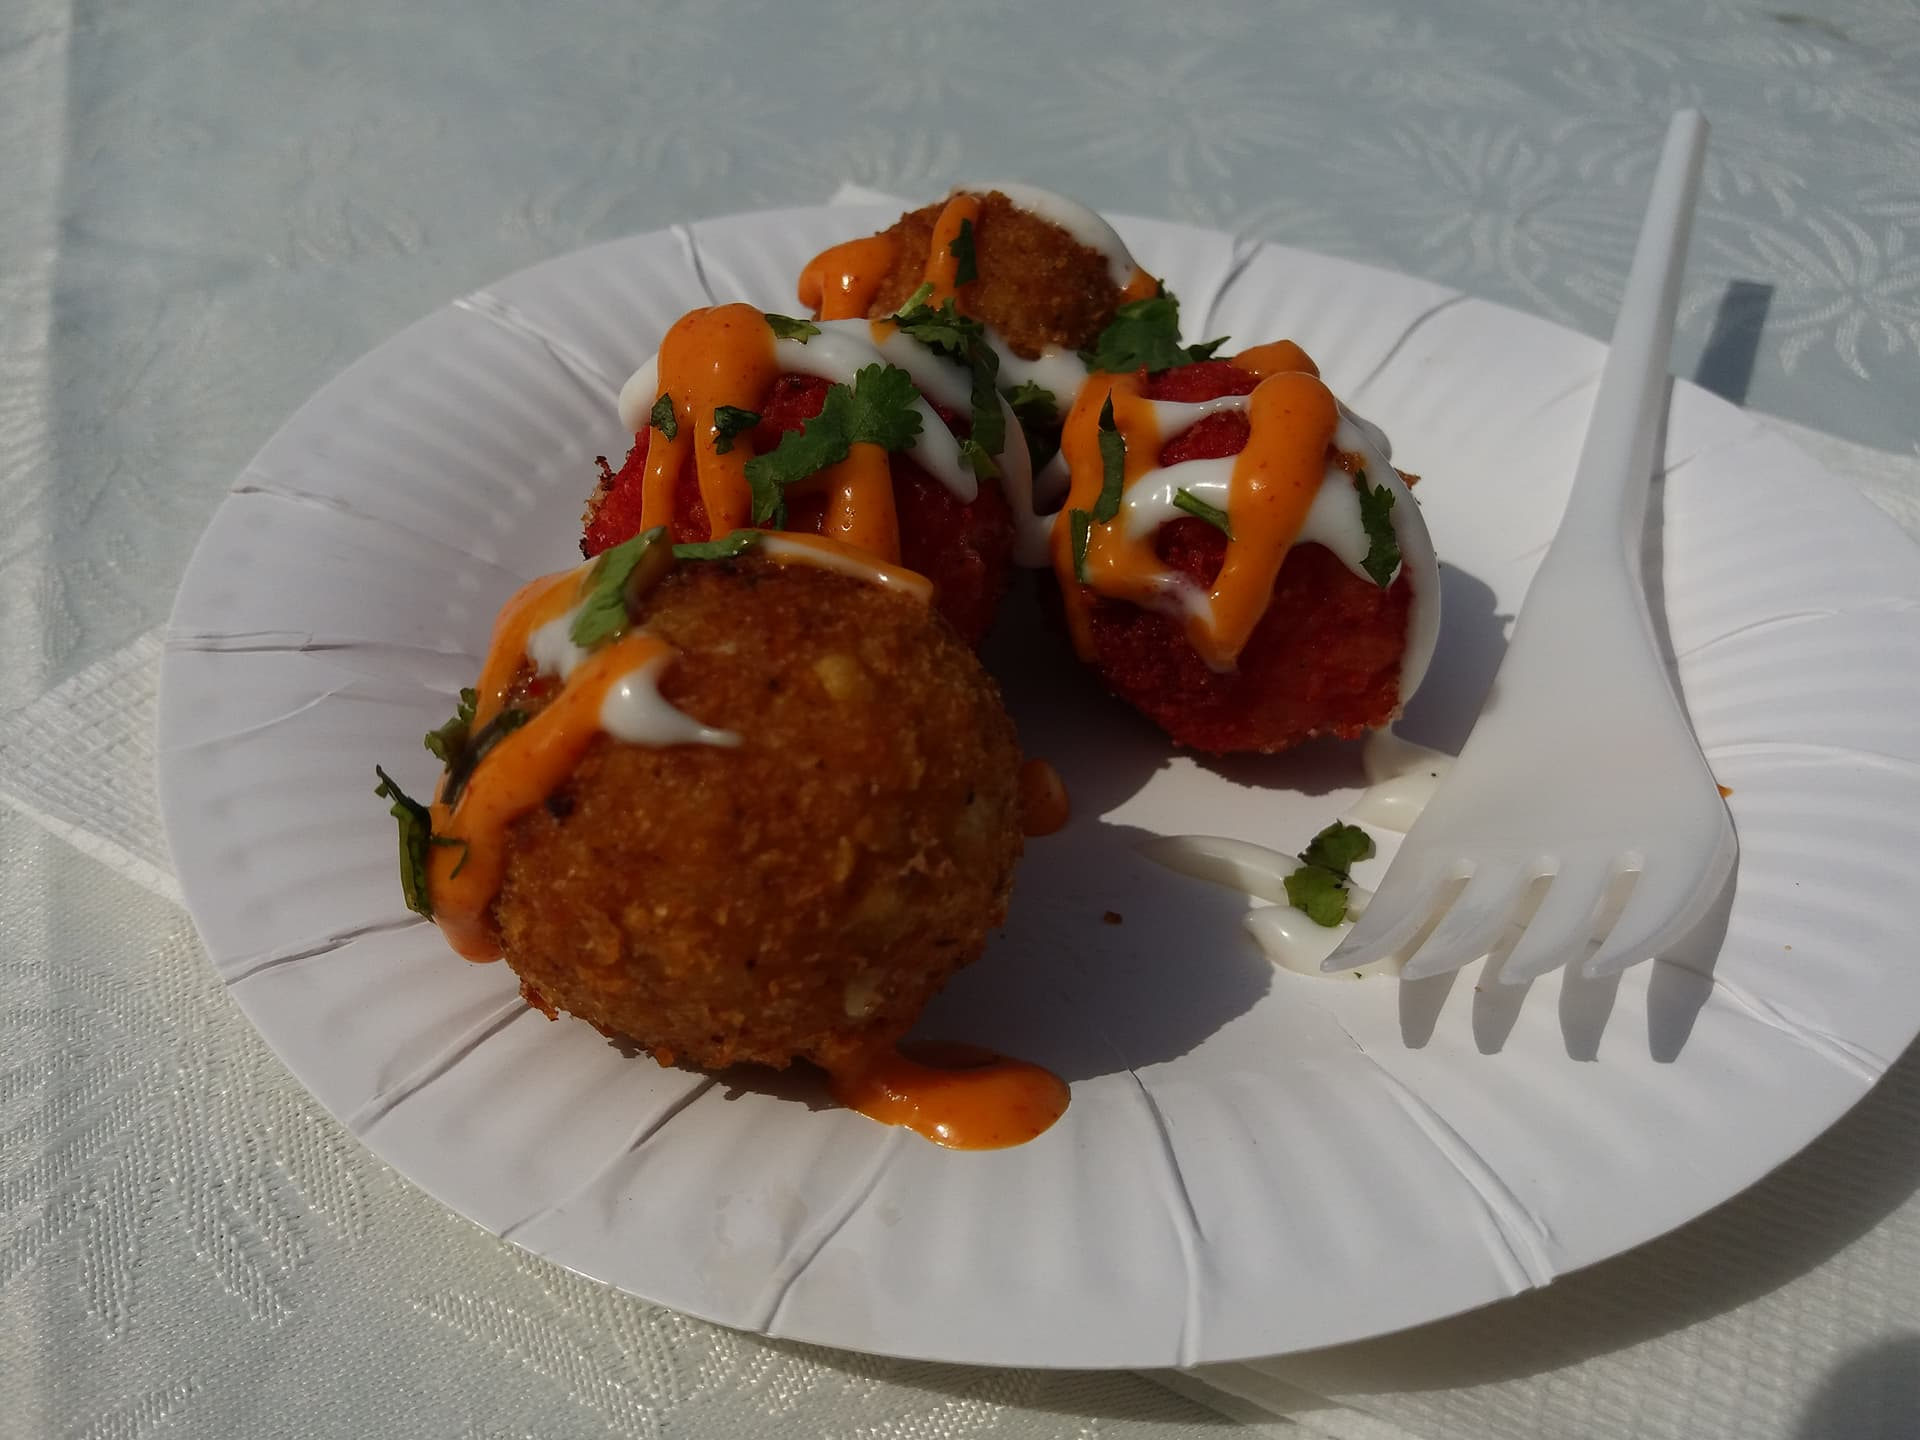 Bits and Vibes By Foodpanda Shafiq Siddiqui 1